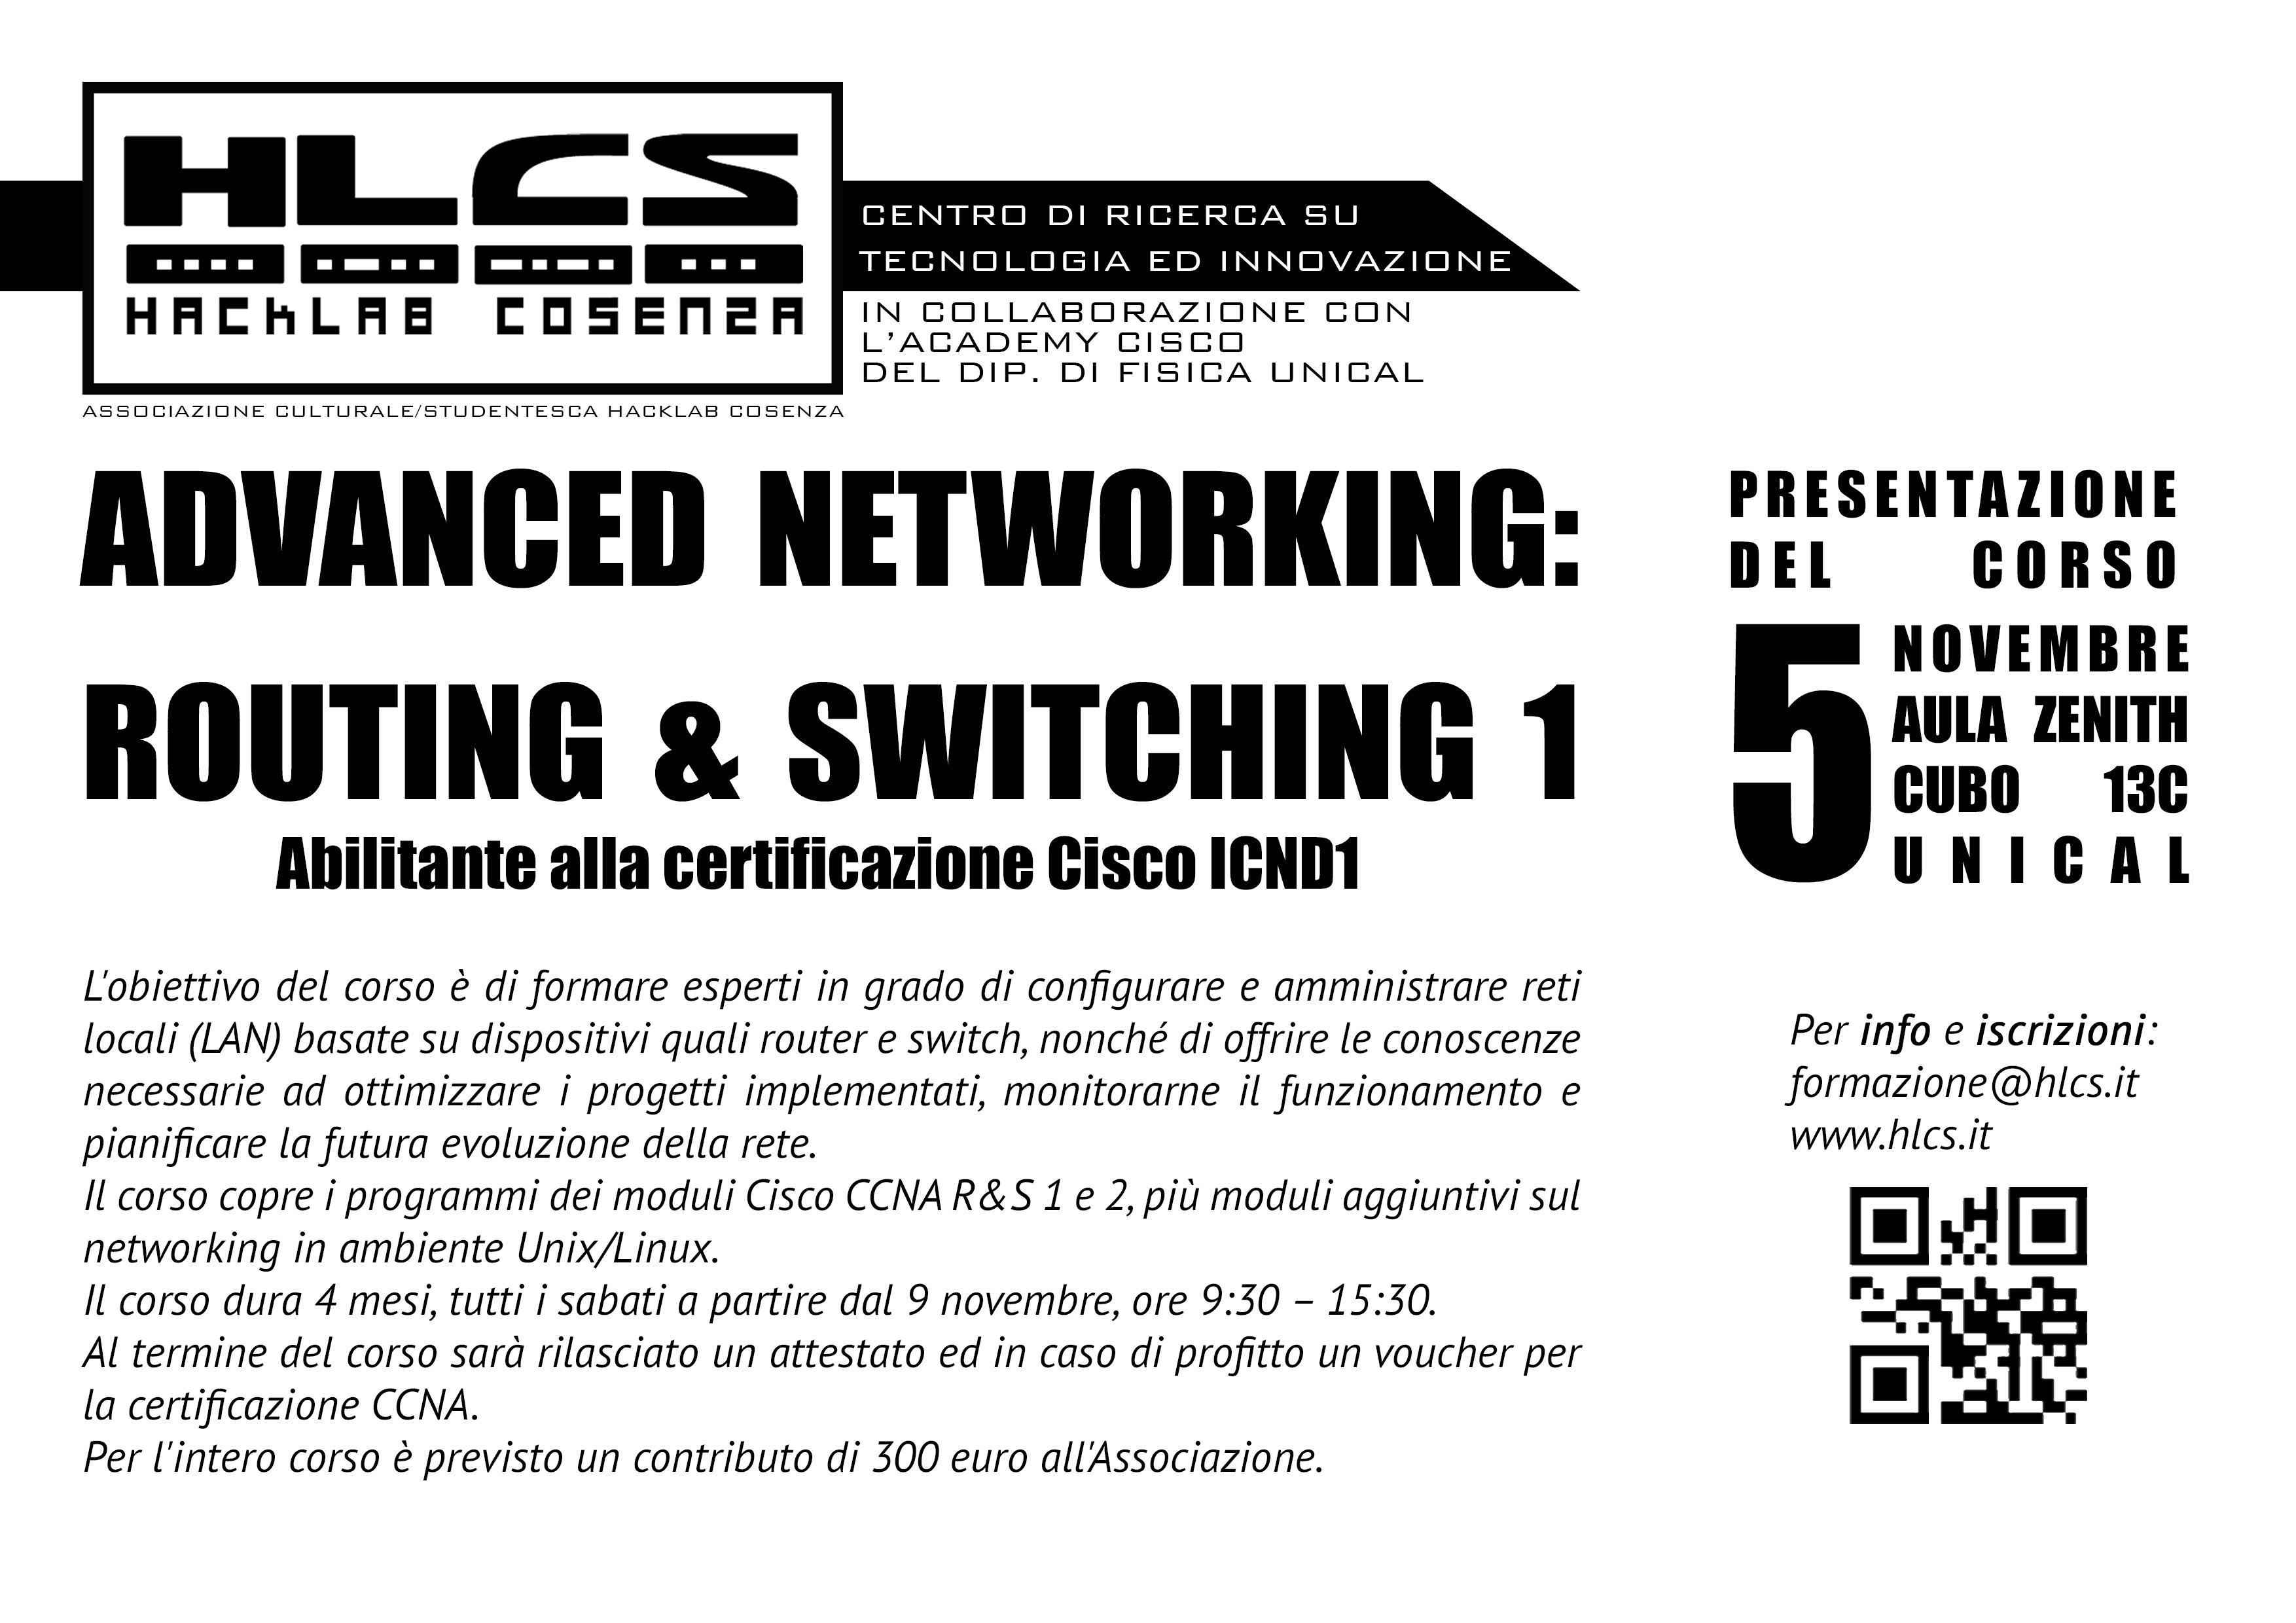 faq sul corso cisco advanced networking routing switching 1 corso networking 1 2013 2014